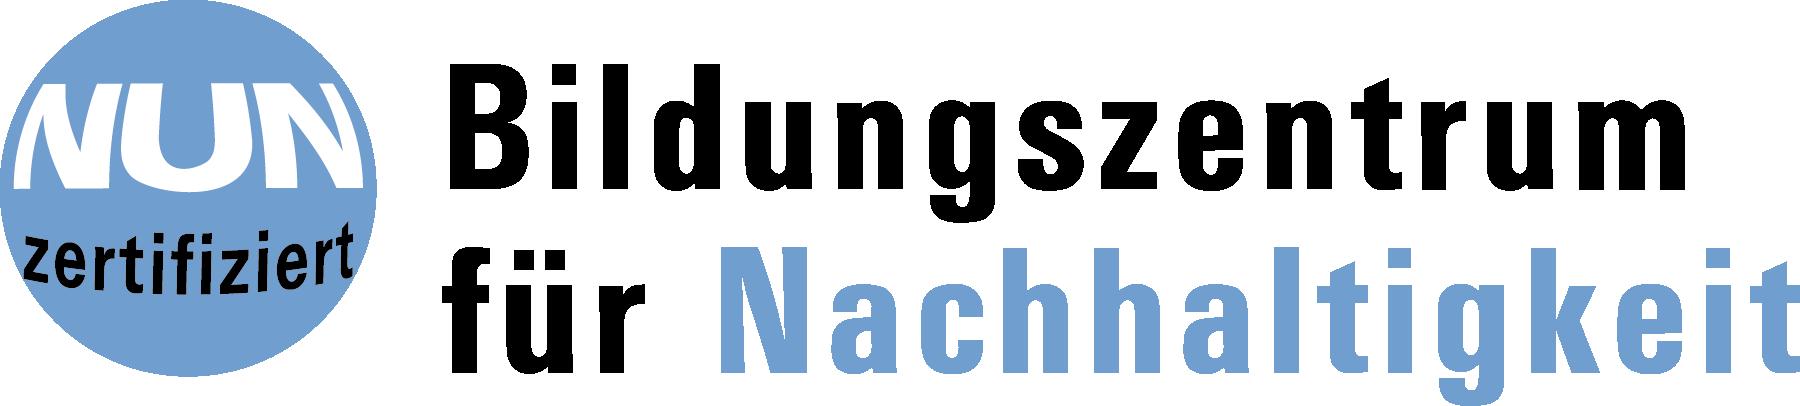 NUN-BfnE-Zentrum-2c_Variante-4